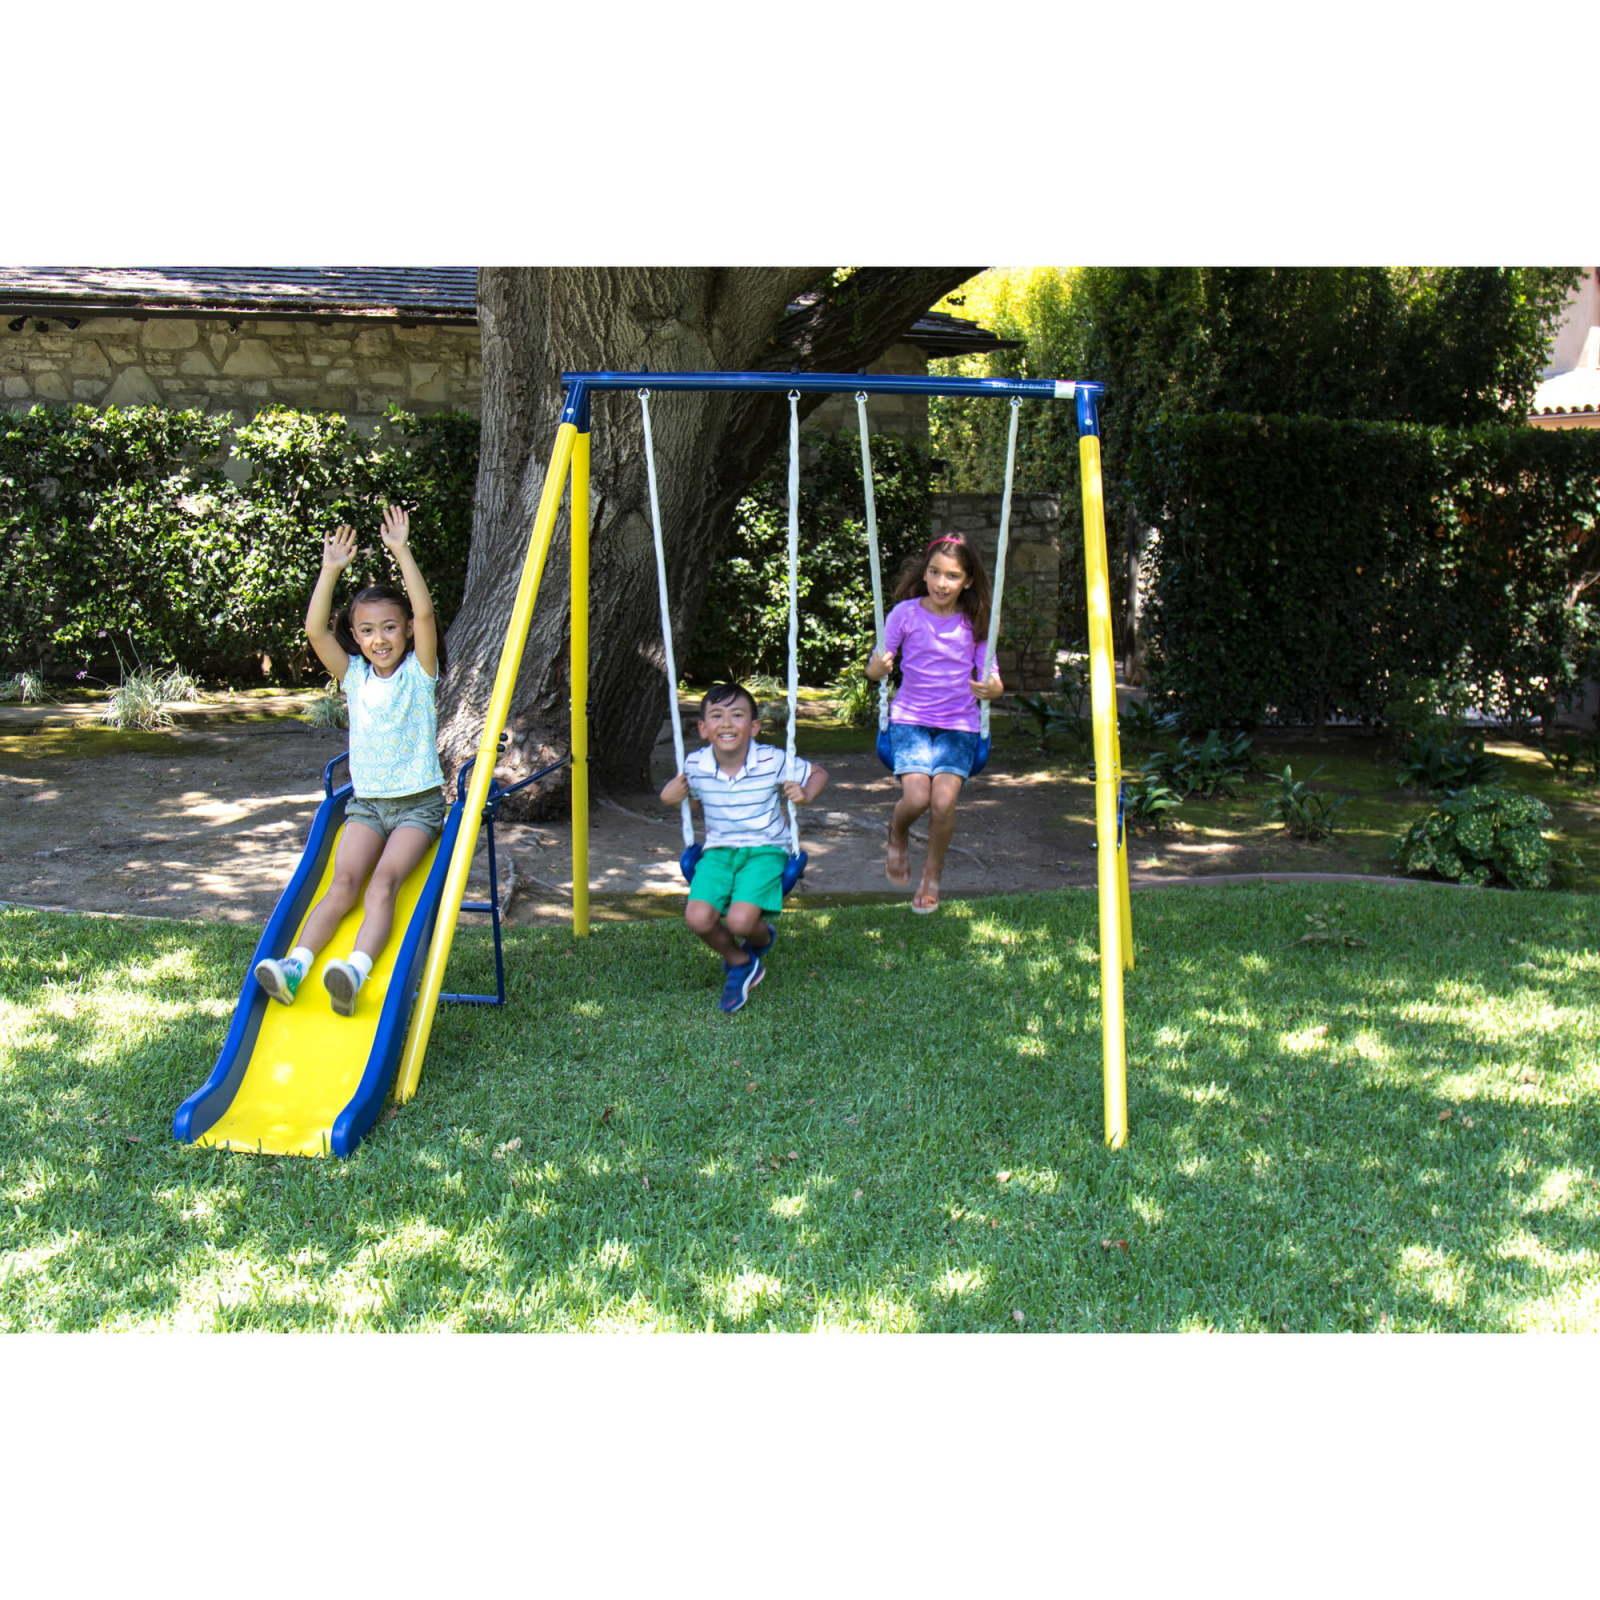 Swing Sets For Backyard Patio Swing For Kids Outdoor Fun Garden Metal Swing  Set